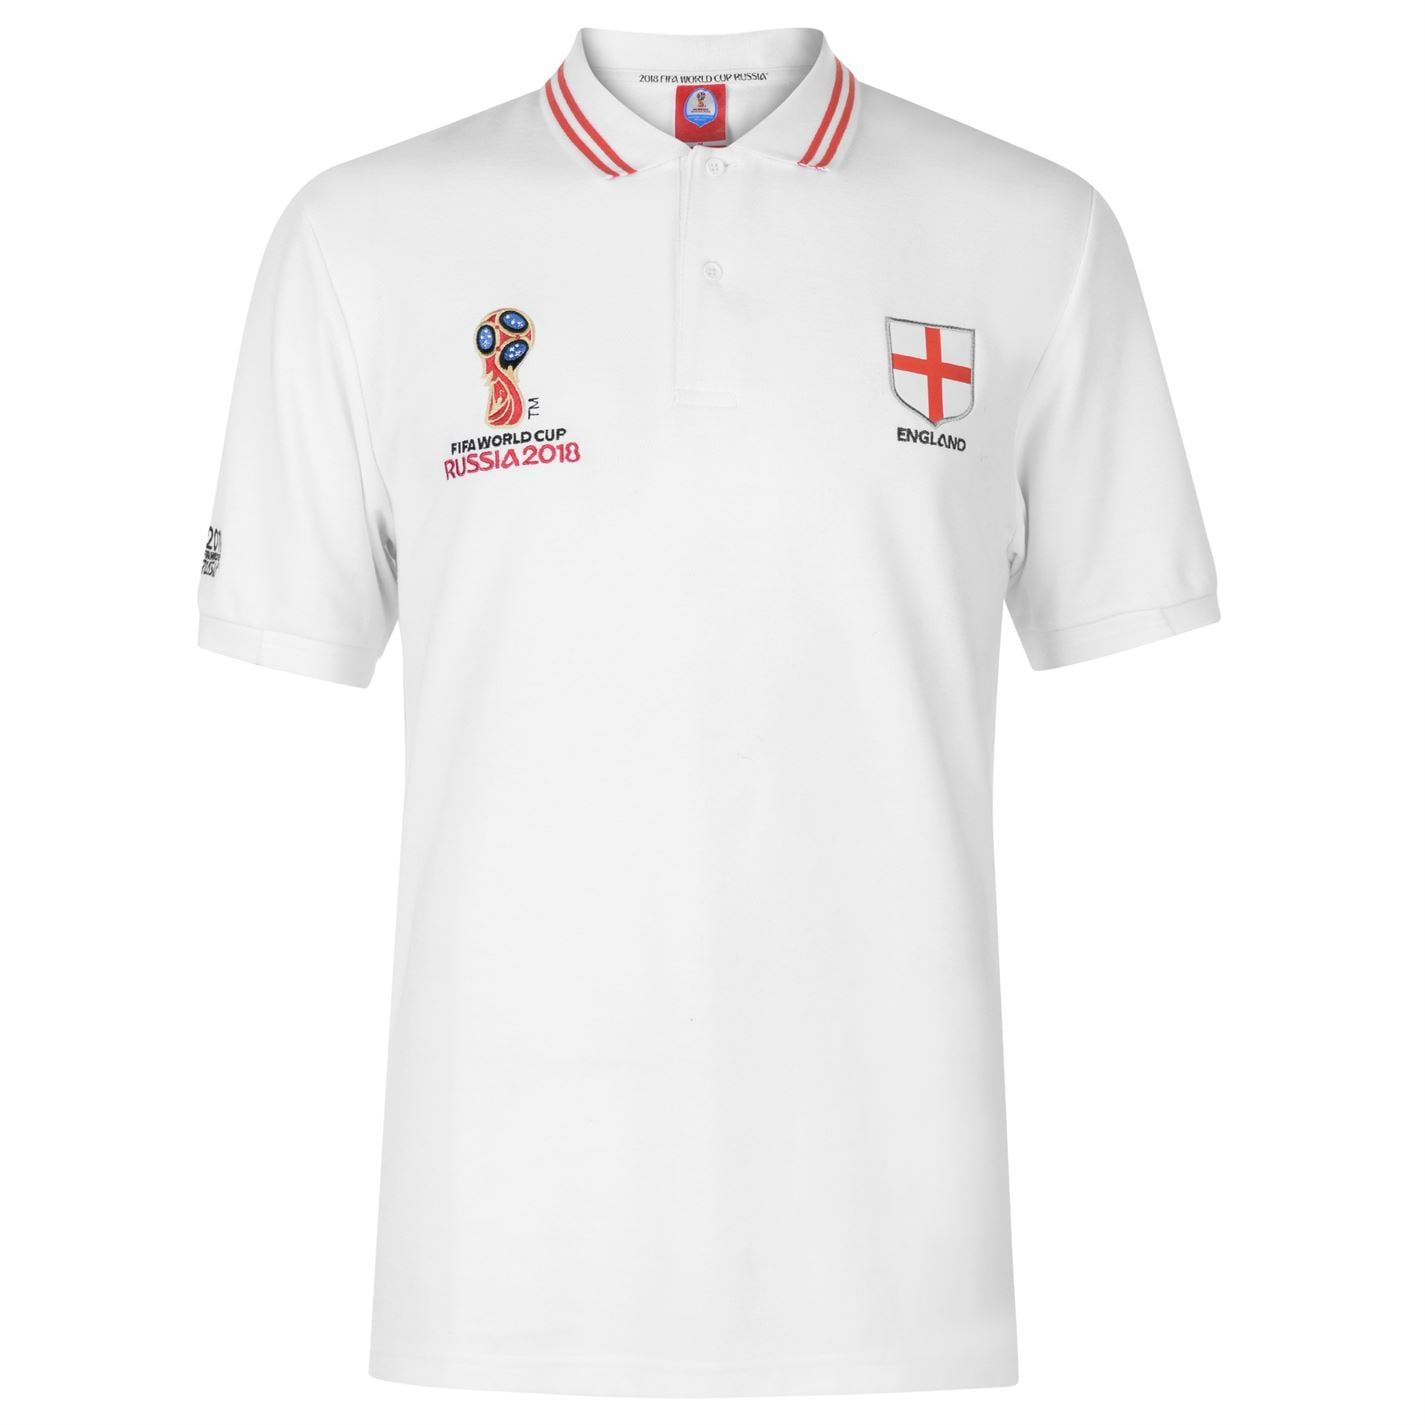 miniature 14 - FIFA Coupe du monde 2018 Angleterre Polo Shirt Homme Football Soccer Top T-Shirt Tee